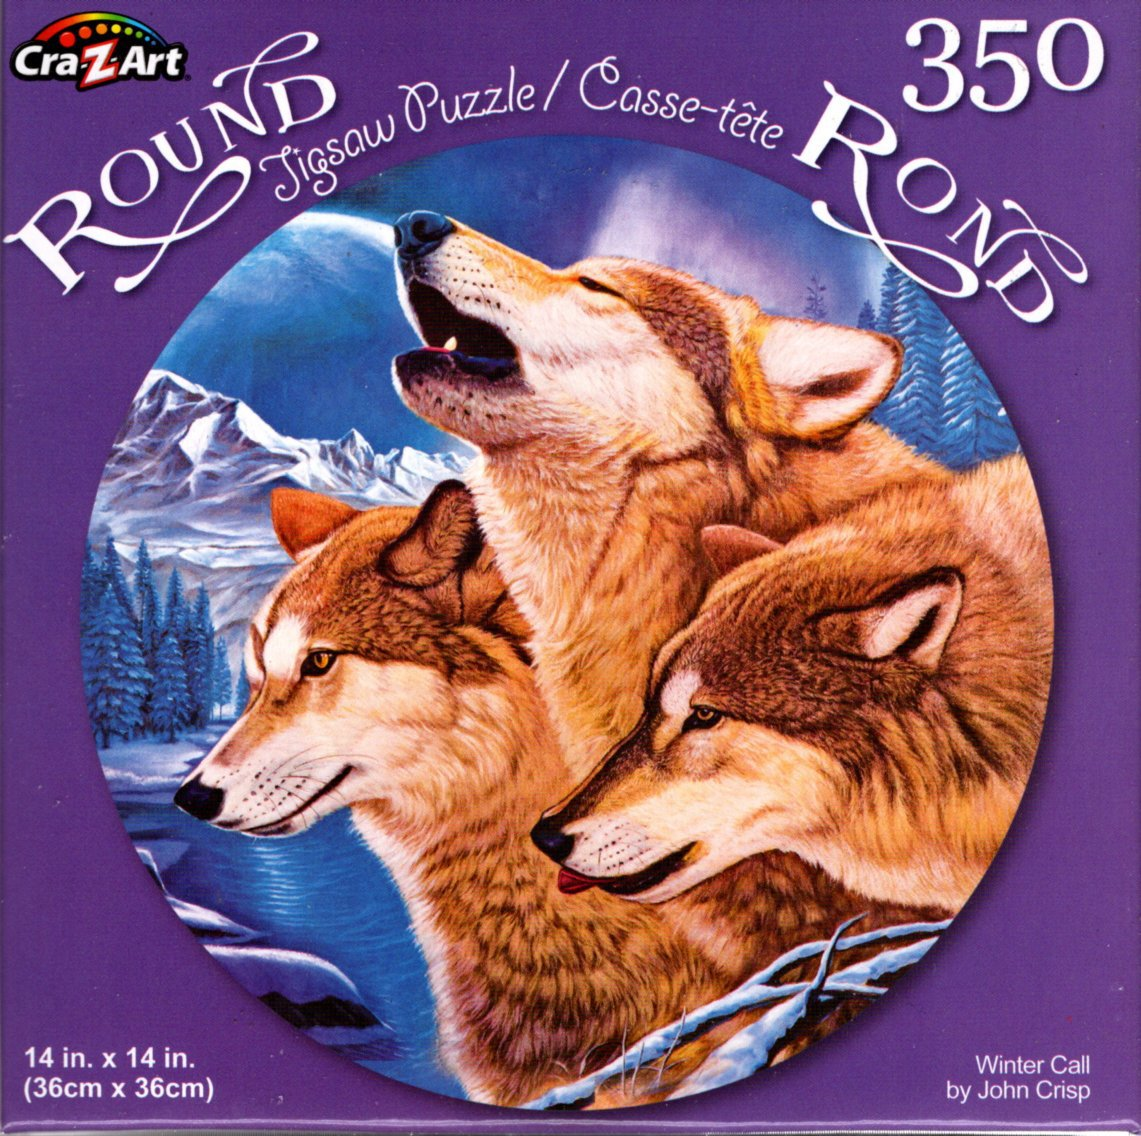 Winter Call by John Crisp - 350 Piece Round Jigsaw Puzzle